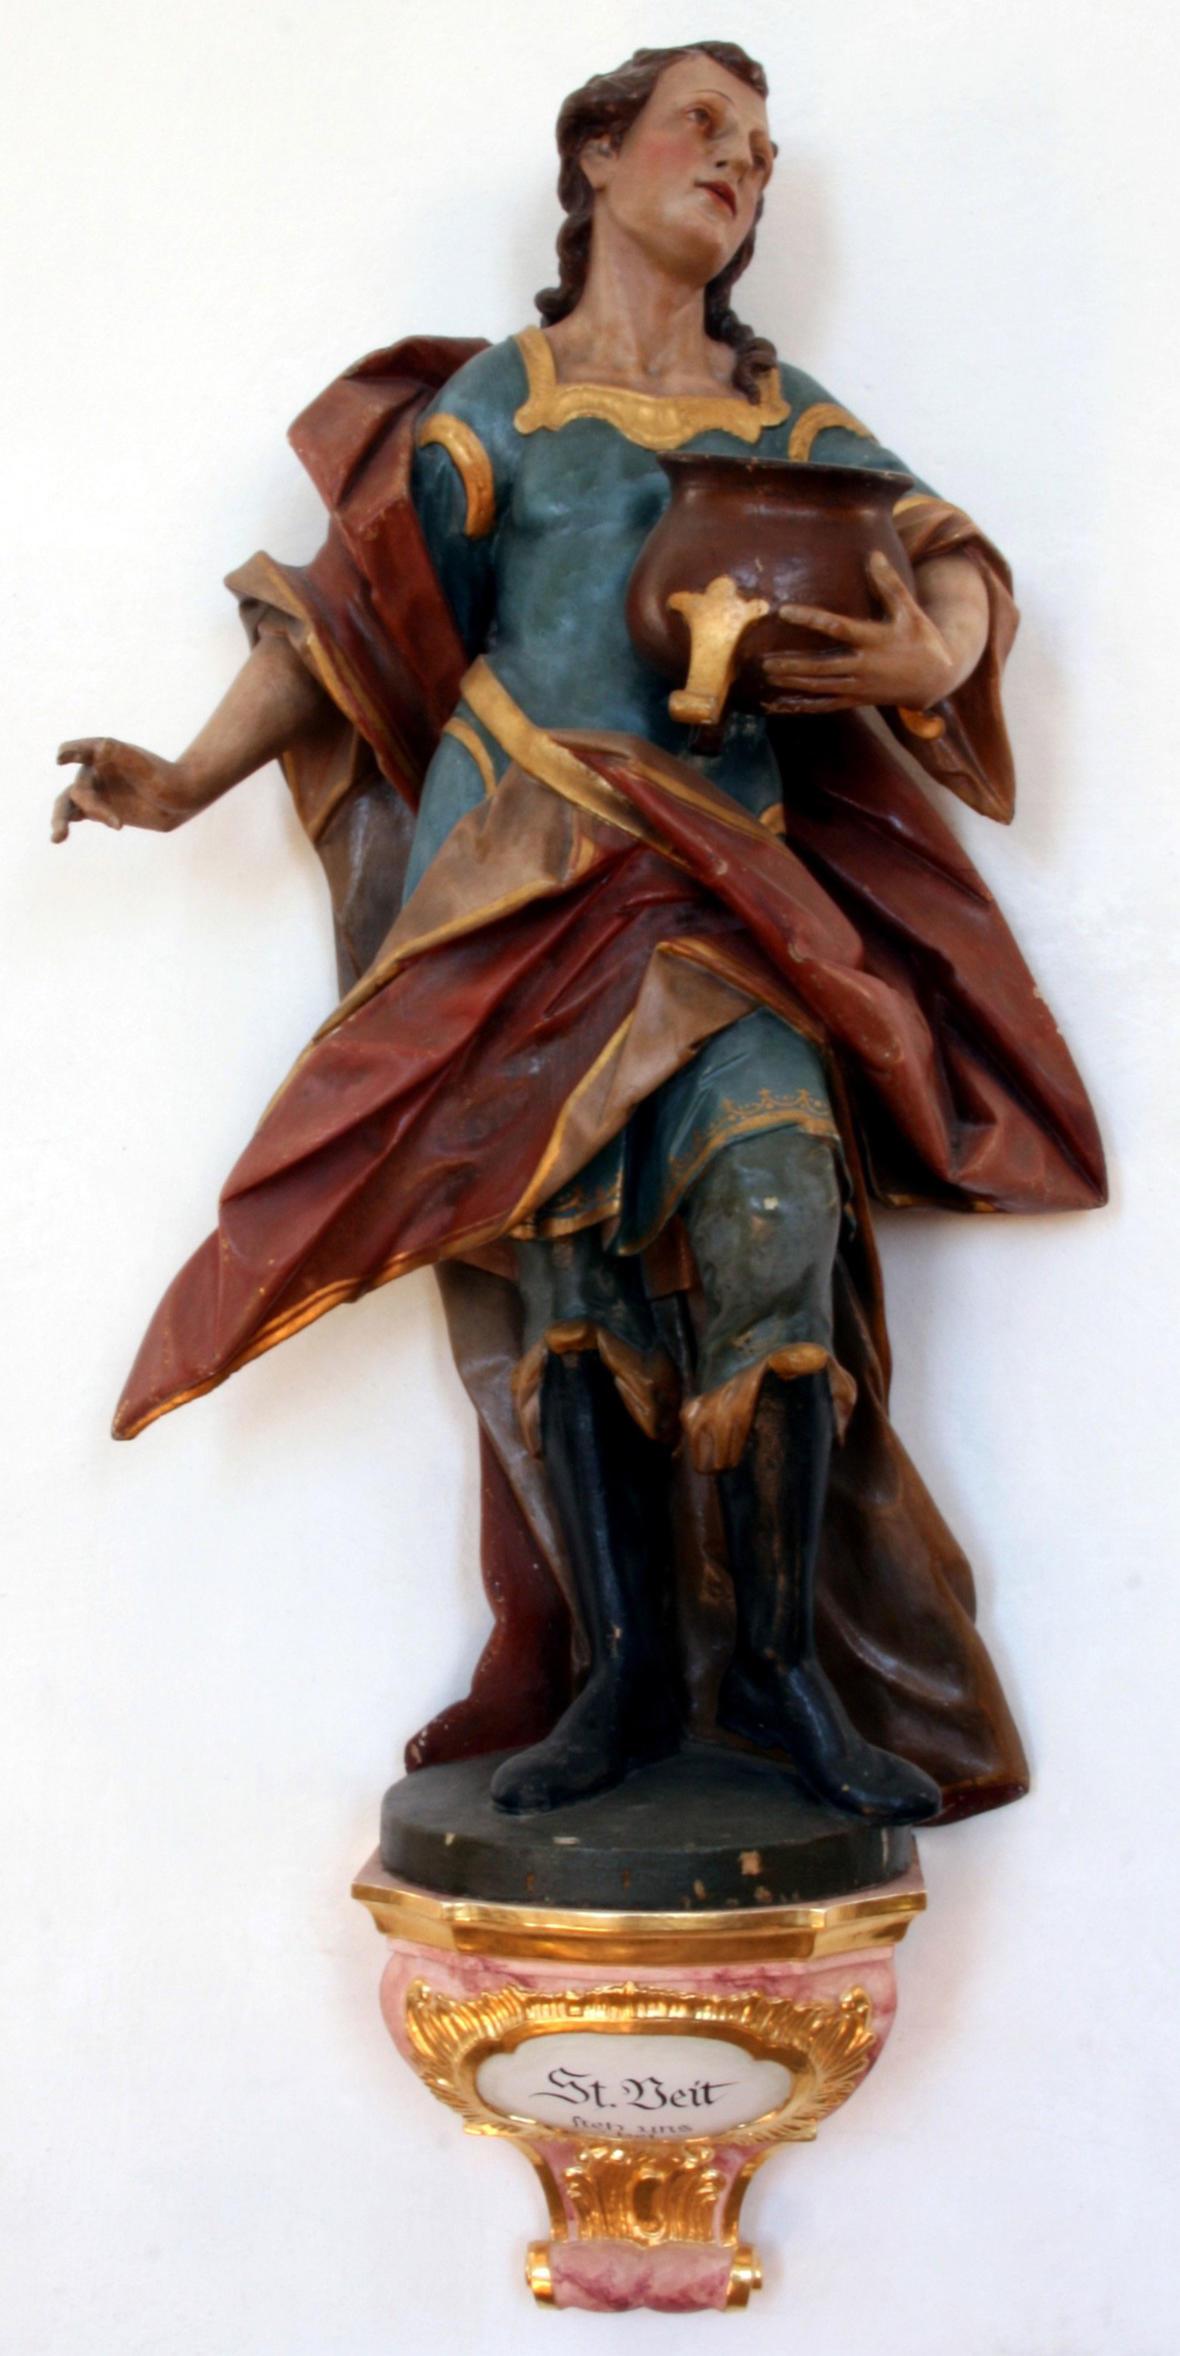 St. Veit